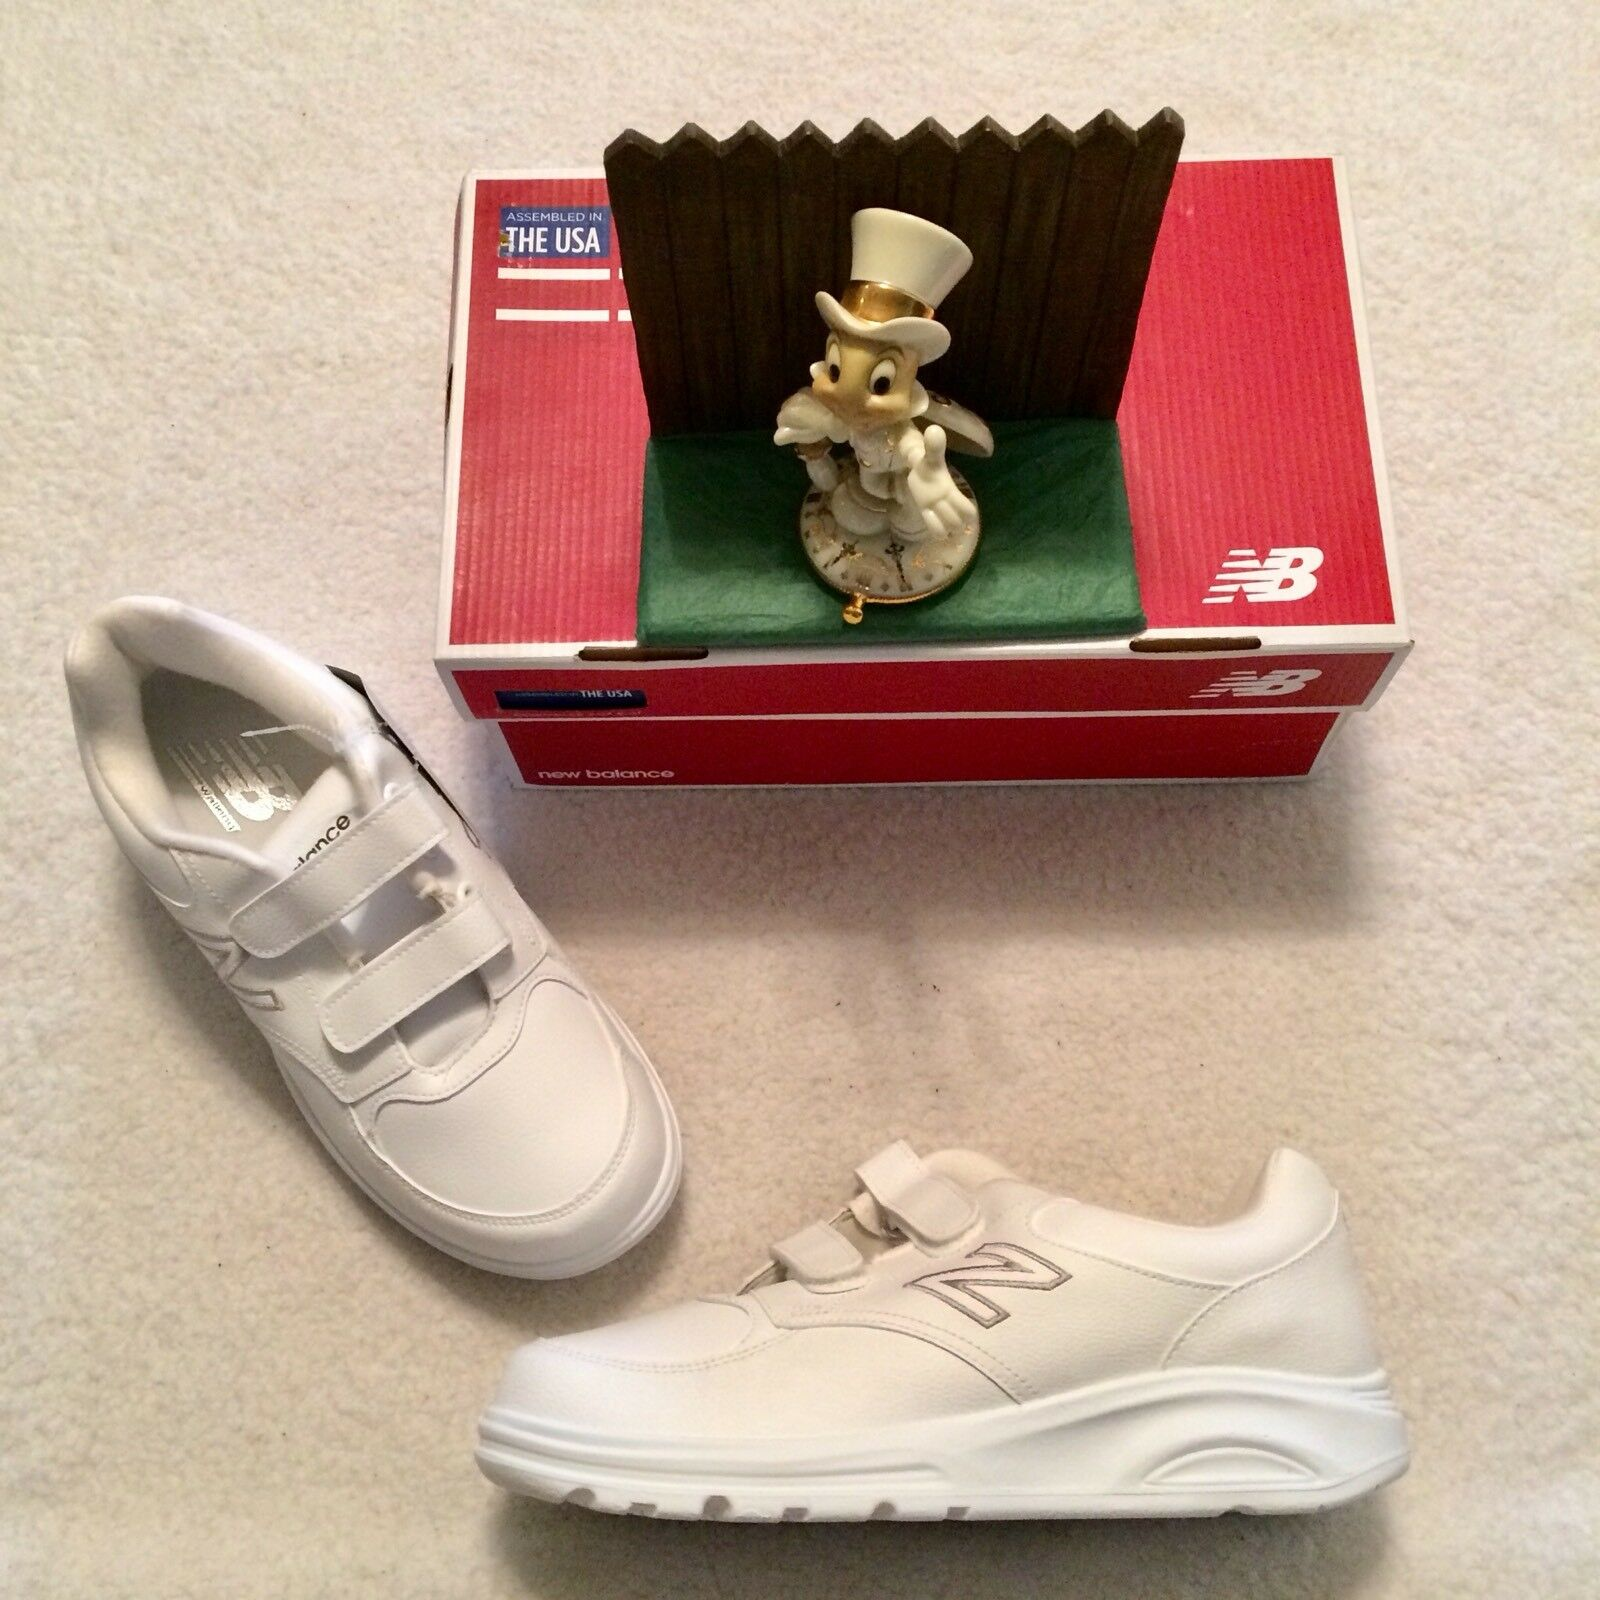 Para Hombre Caminar 674 New Balance Gancho y Lazo Zapatos Nuevo..  Blanco 10/44 4E Nuevo.. Zapatos x ancho 1327e5